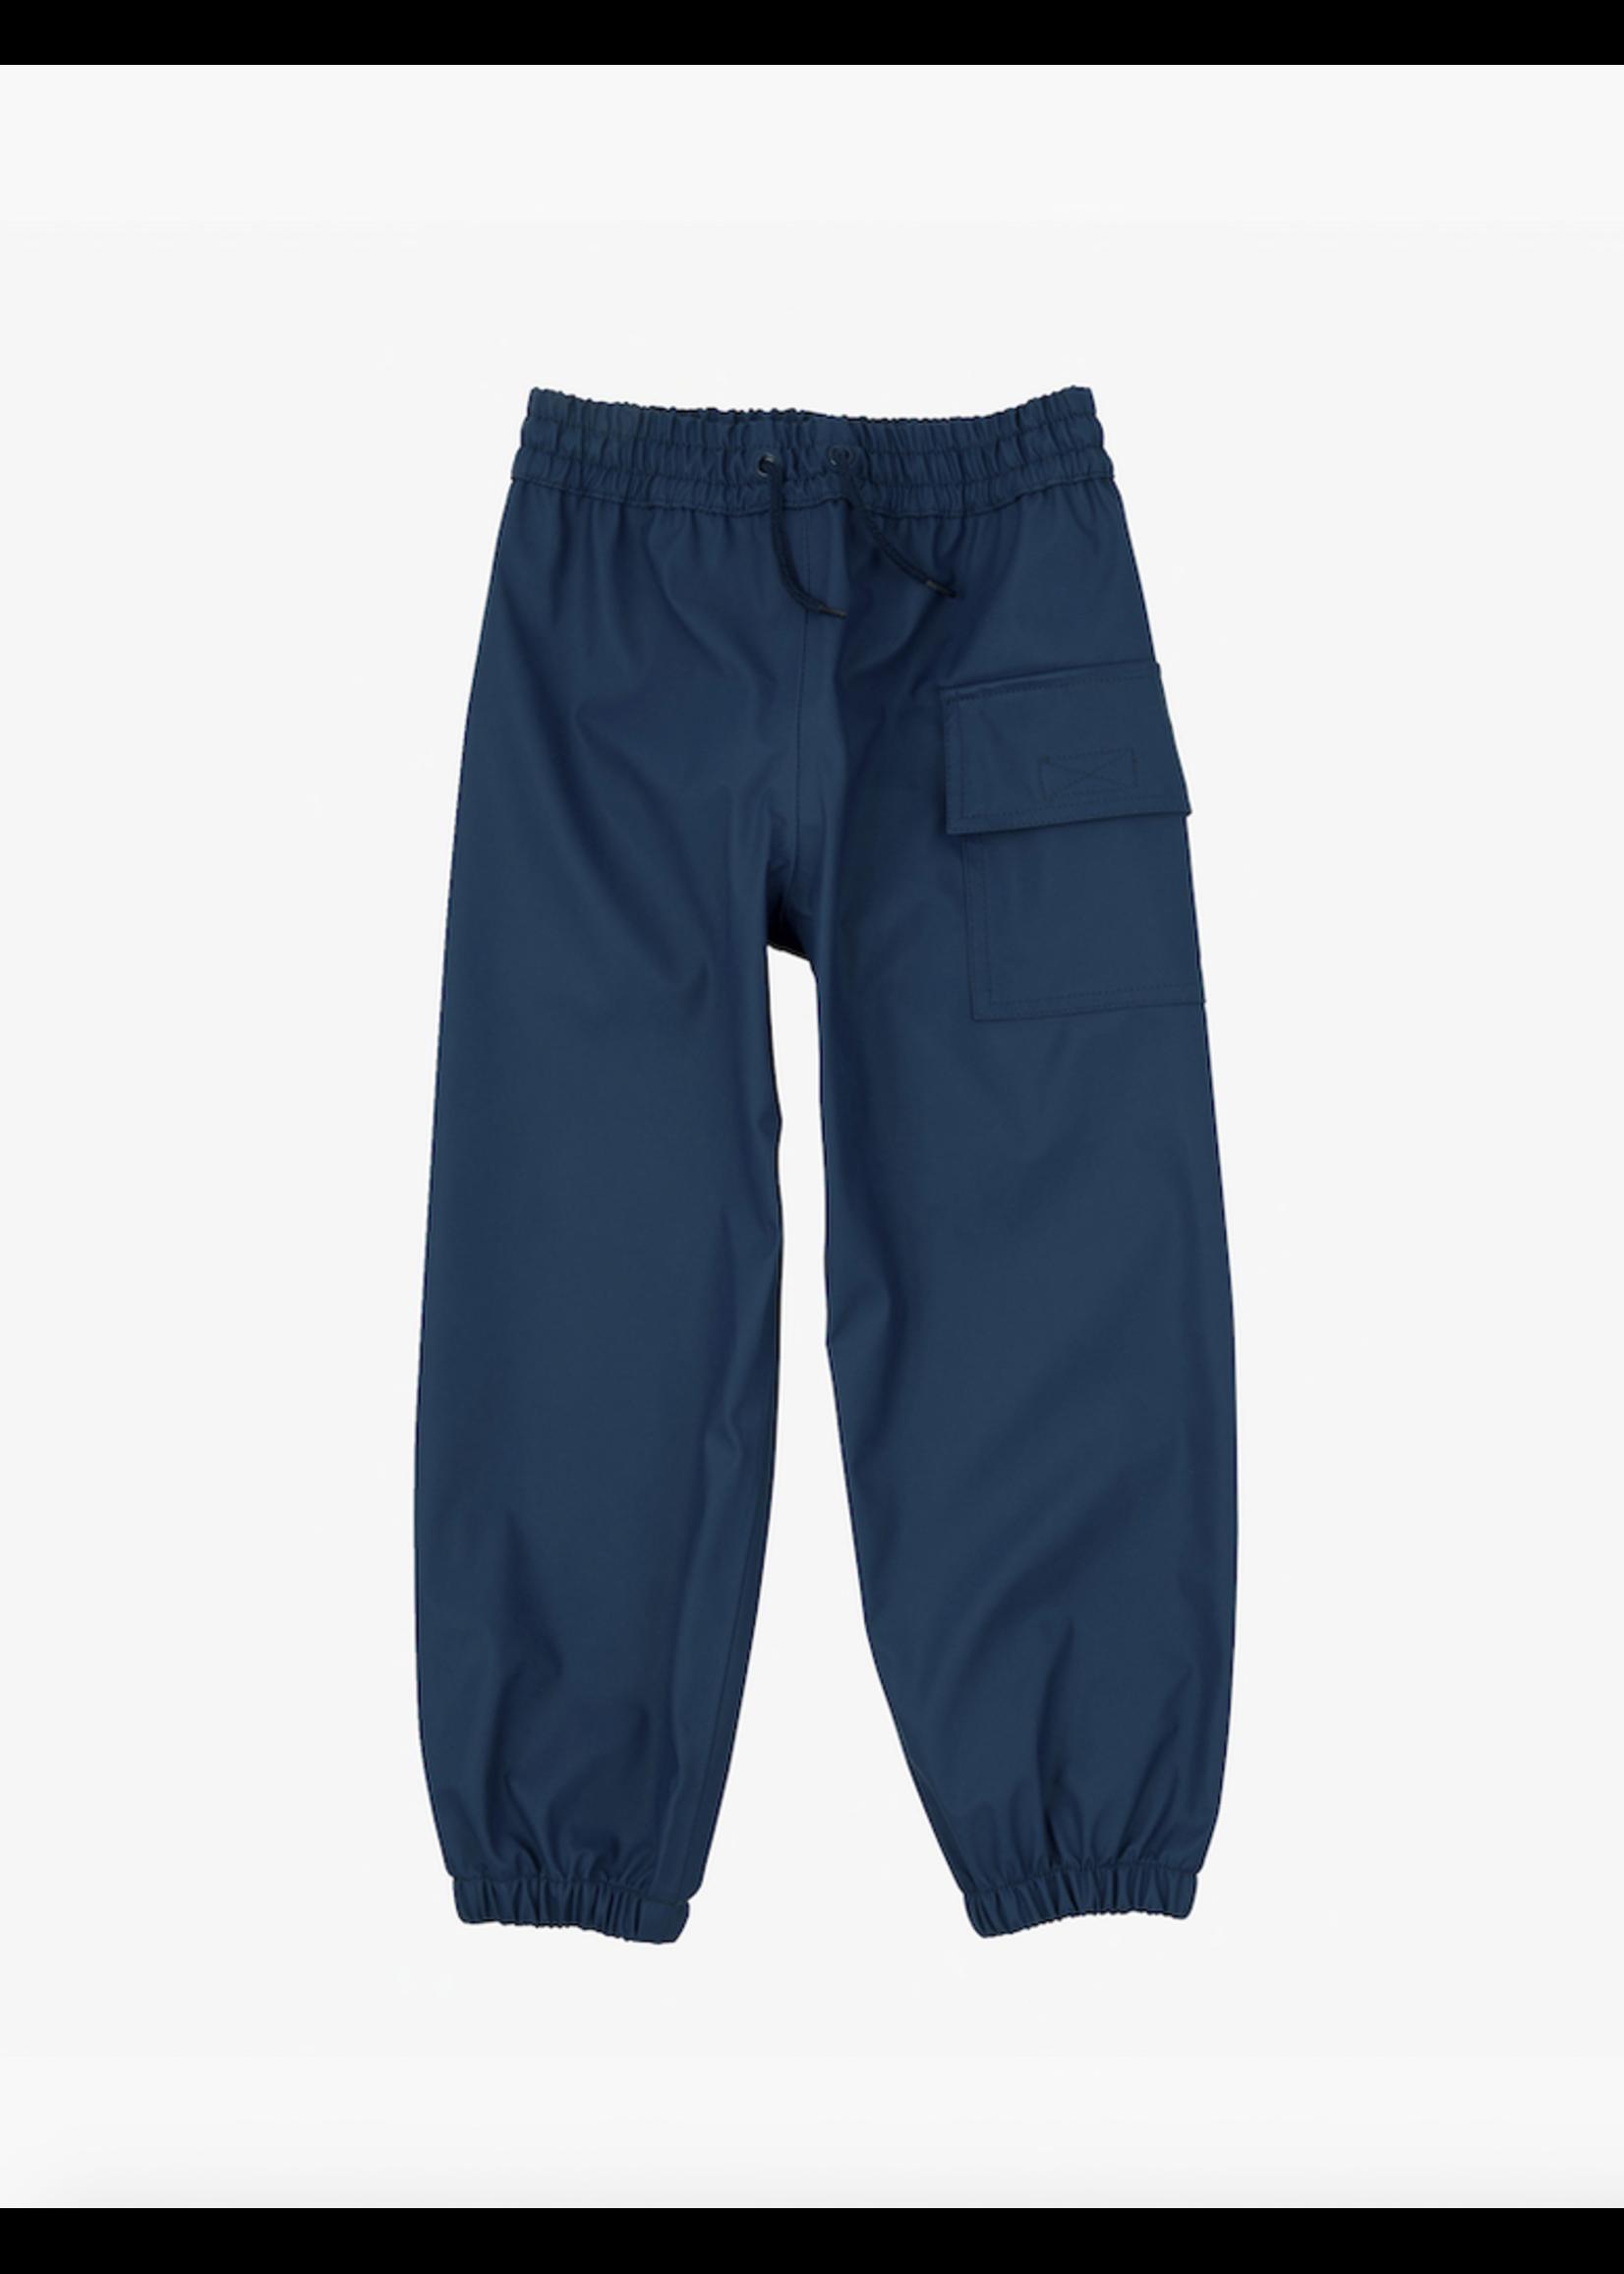 Hatley Hatley, Classic Navy Splash Pants